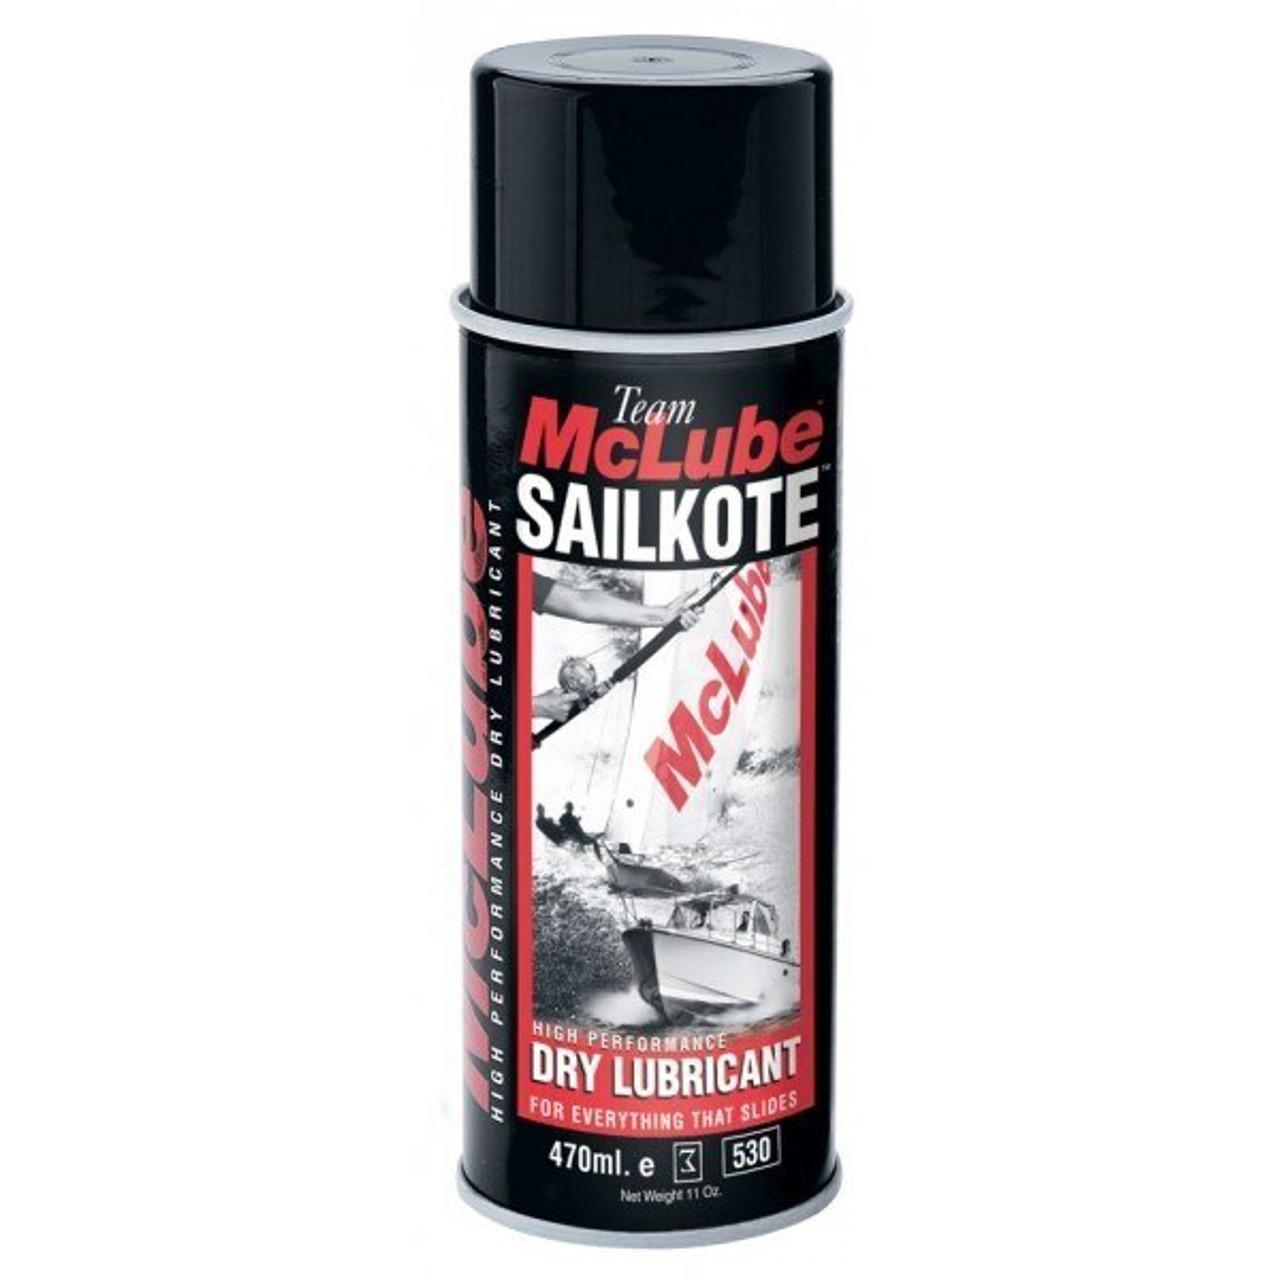 McLube Sailkote Dry Lubricant - 470ml